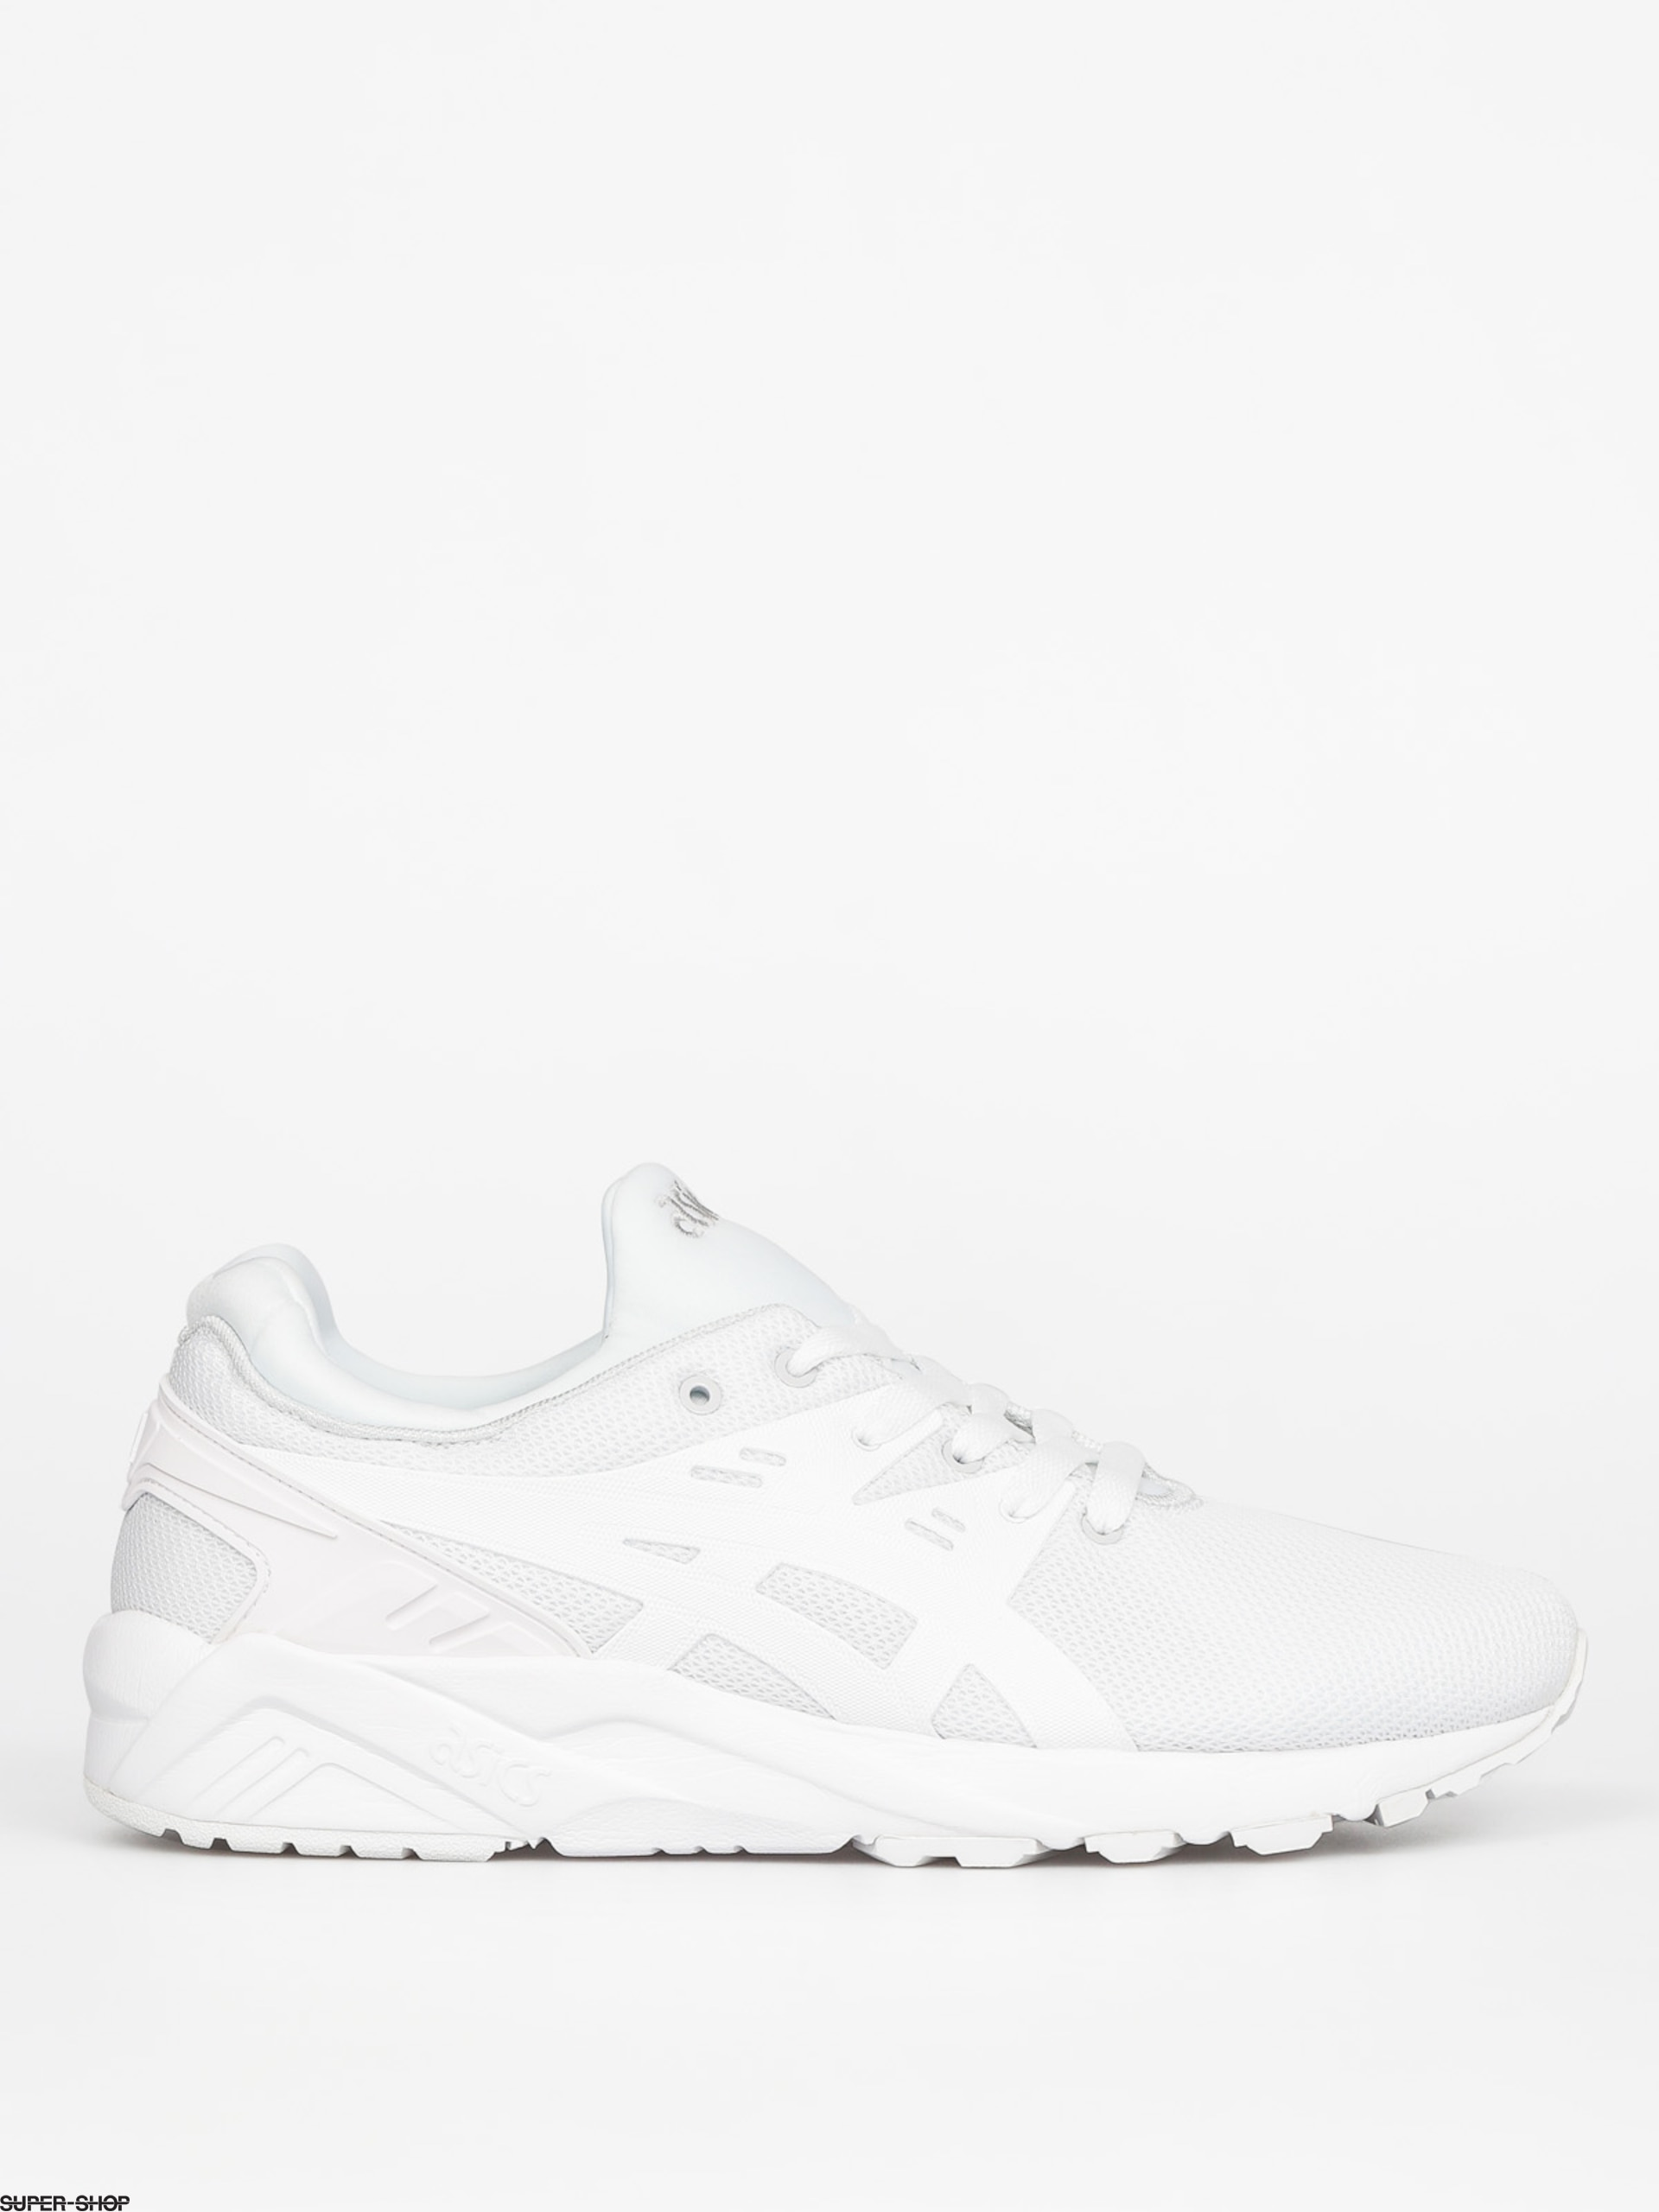 big sale a528c 5b199 Asics Shoes Gel Kayano Trainer Evo (white/white)